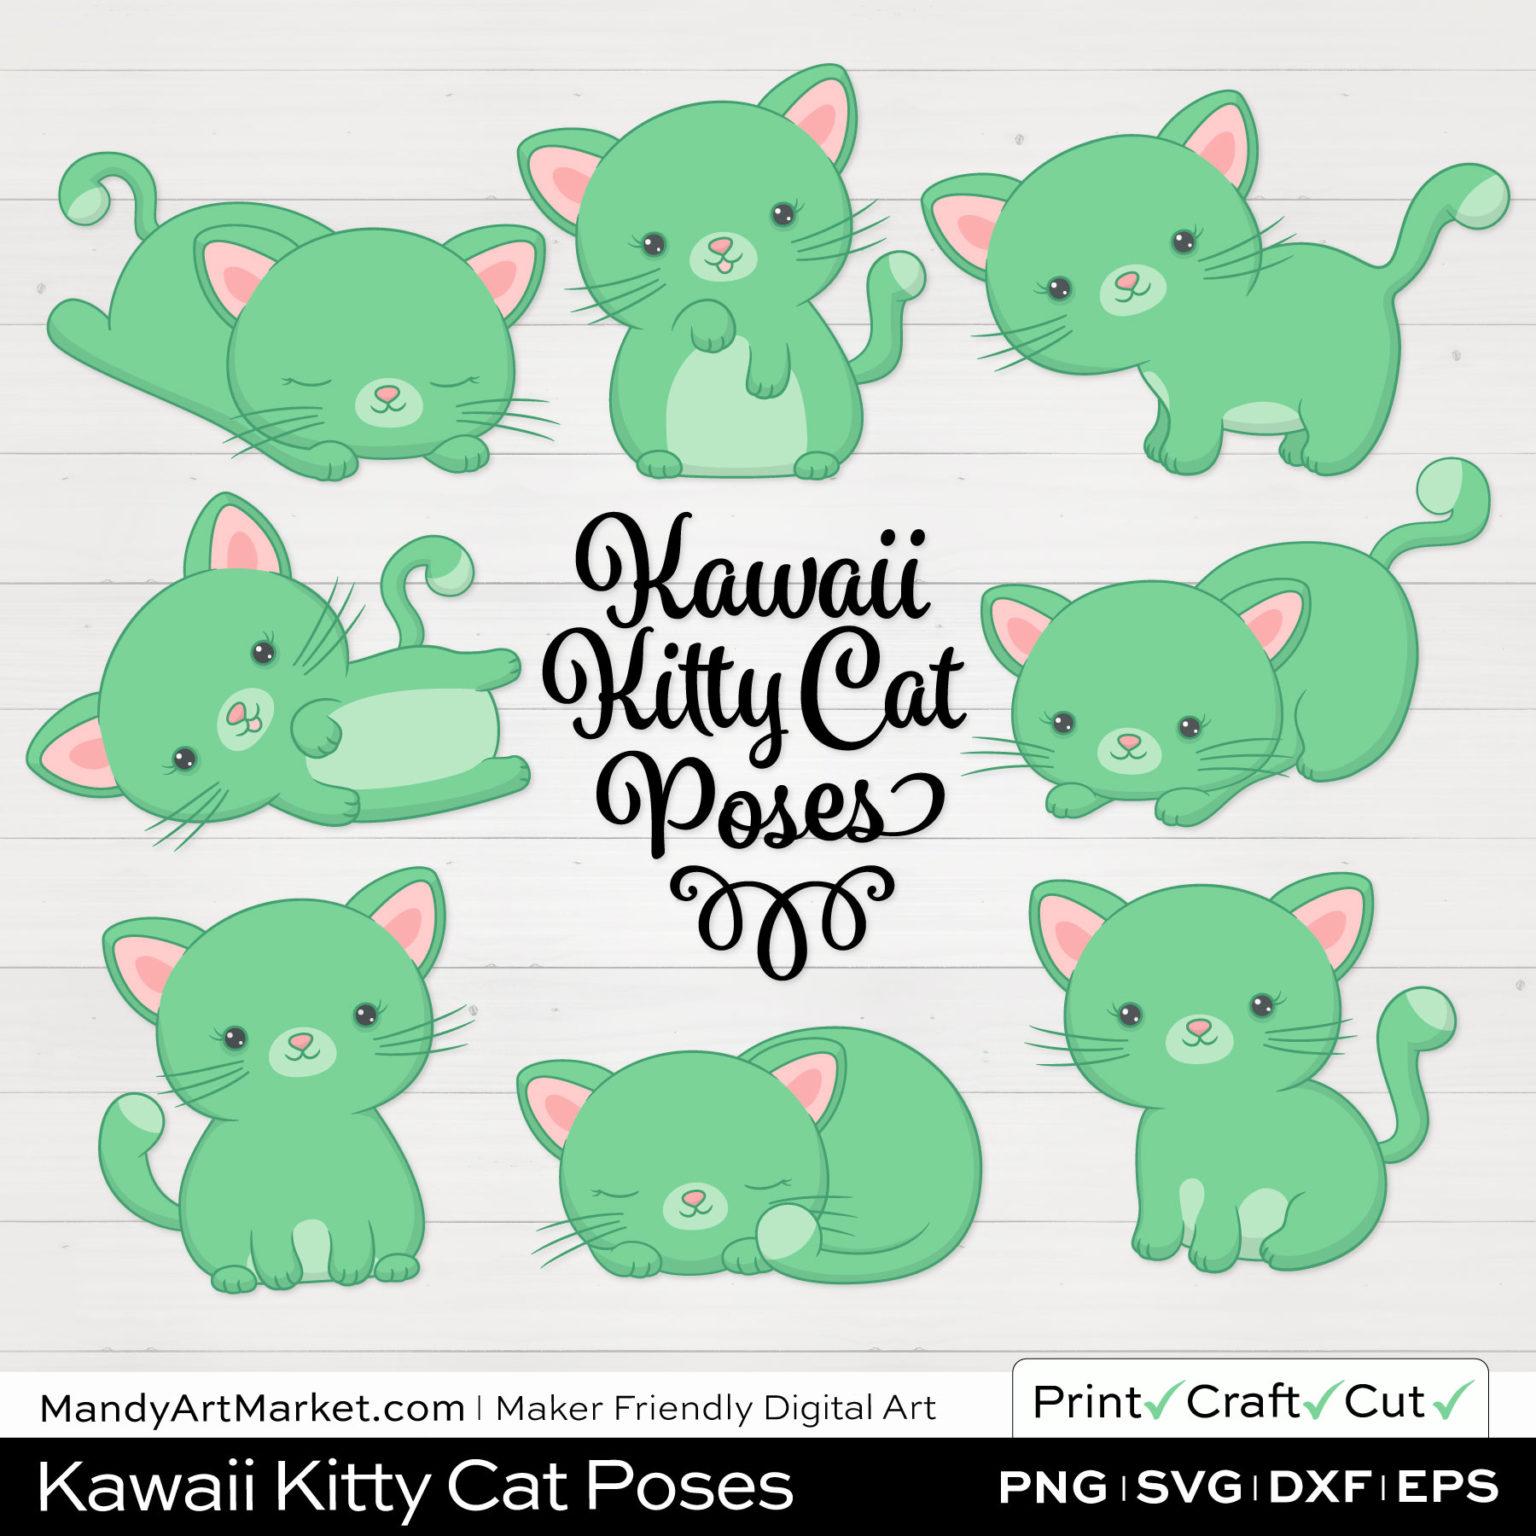 Light Fern Green Kawaii Kitty Cat Poses Clipart on White Background